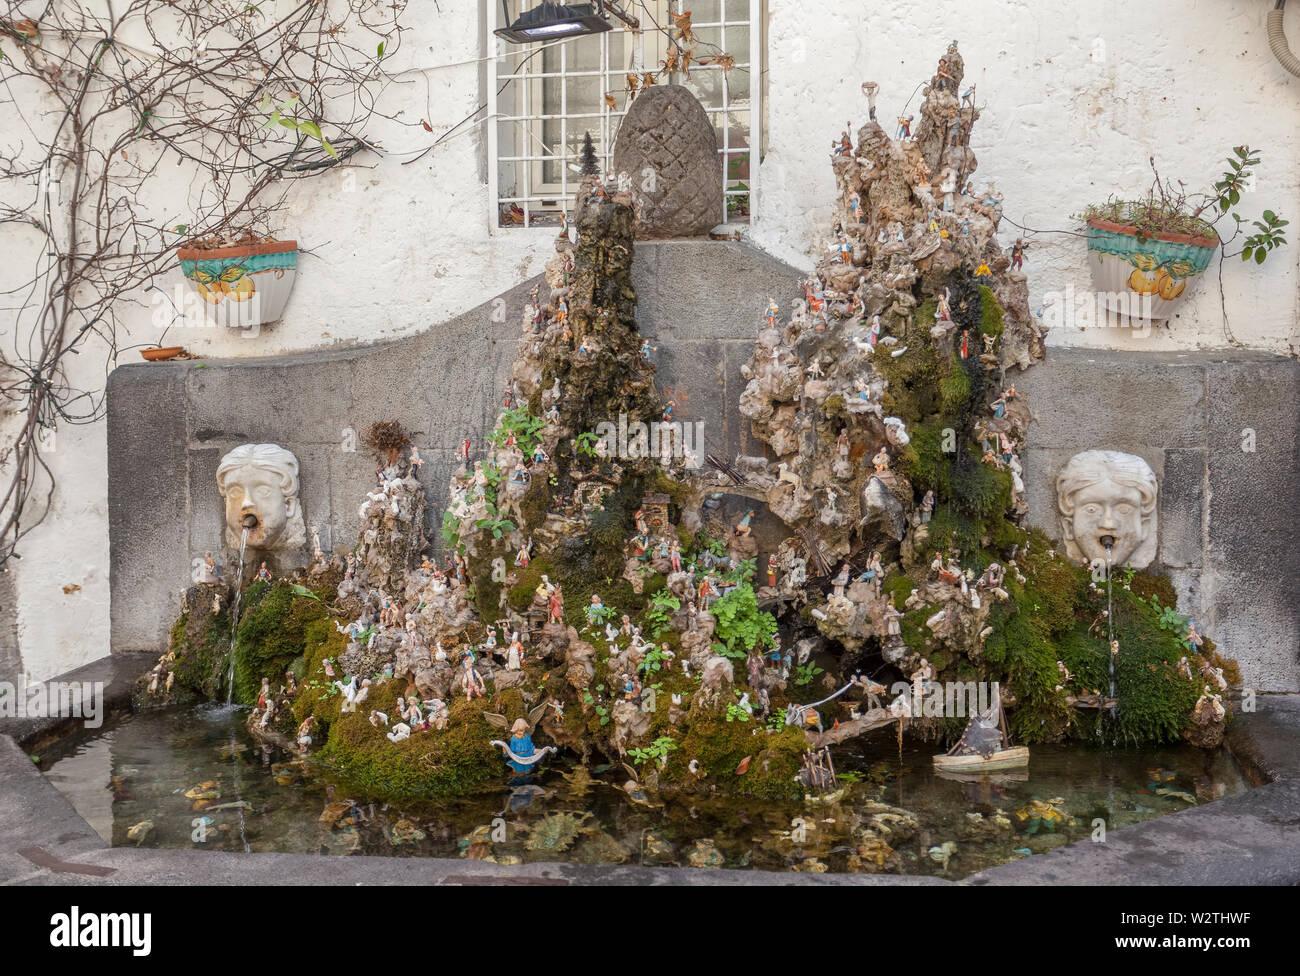 Amalfi creche and fountain. In the Amalfi city centre, CostieraAmalfitana, Amalfi Coast, Salerno, Campania, Italy - Stock Image